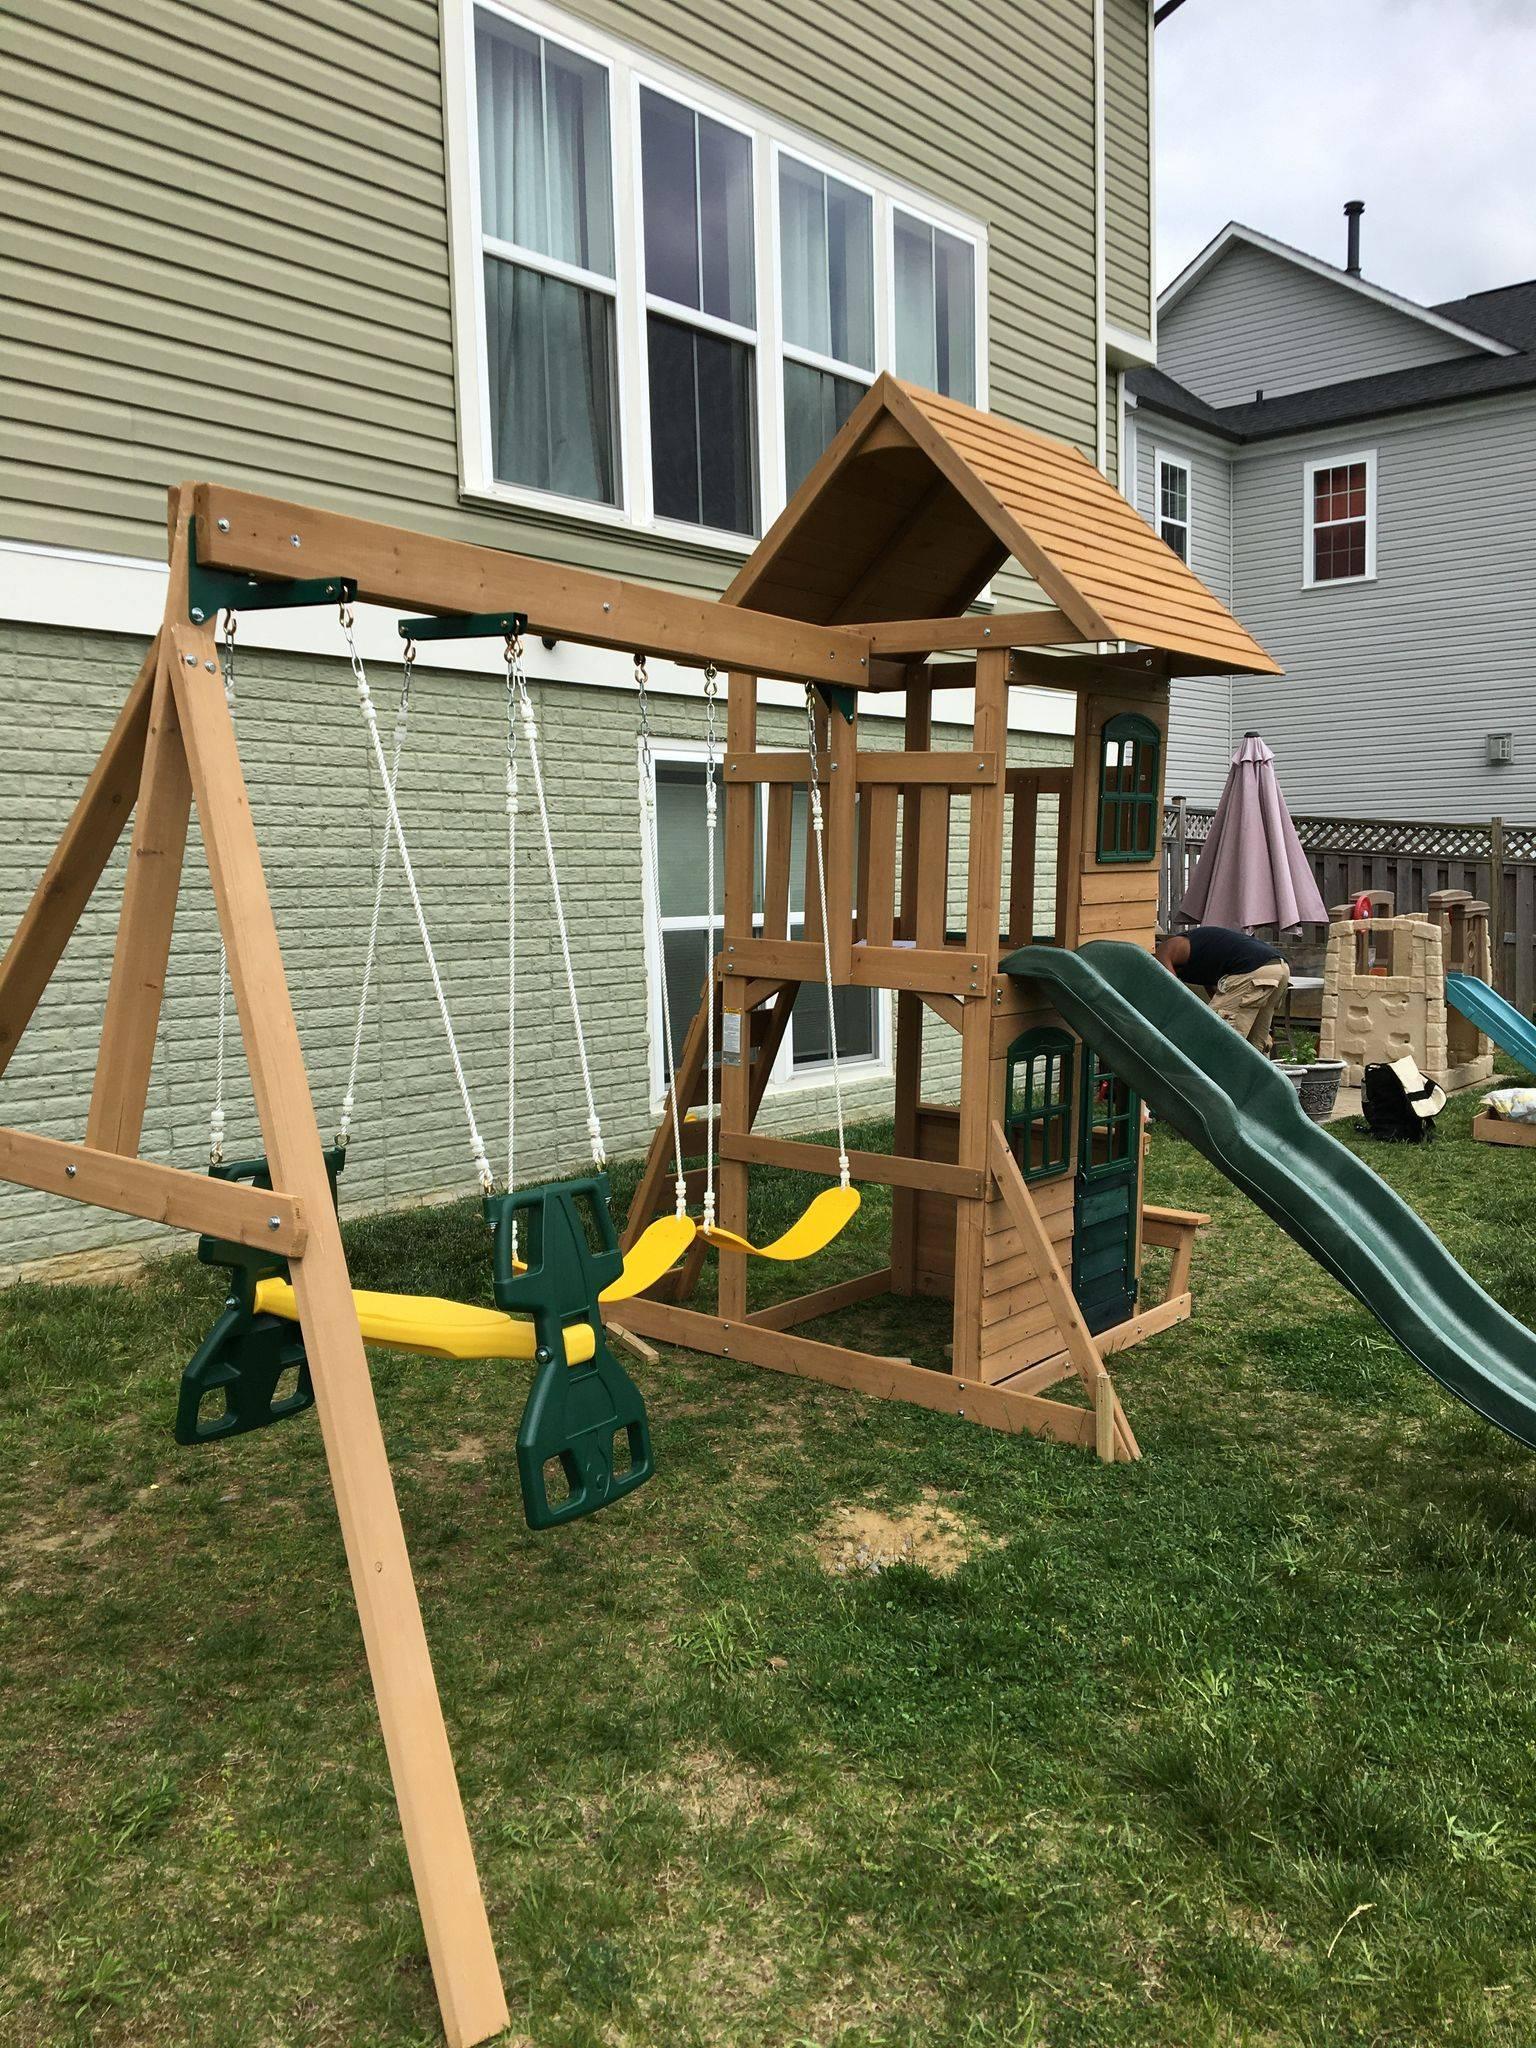 Big Backyard F23220 Windale swing set assembly in Fairfax Virginia